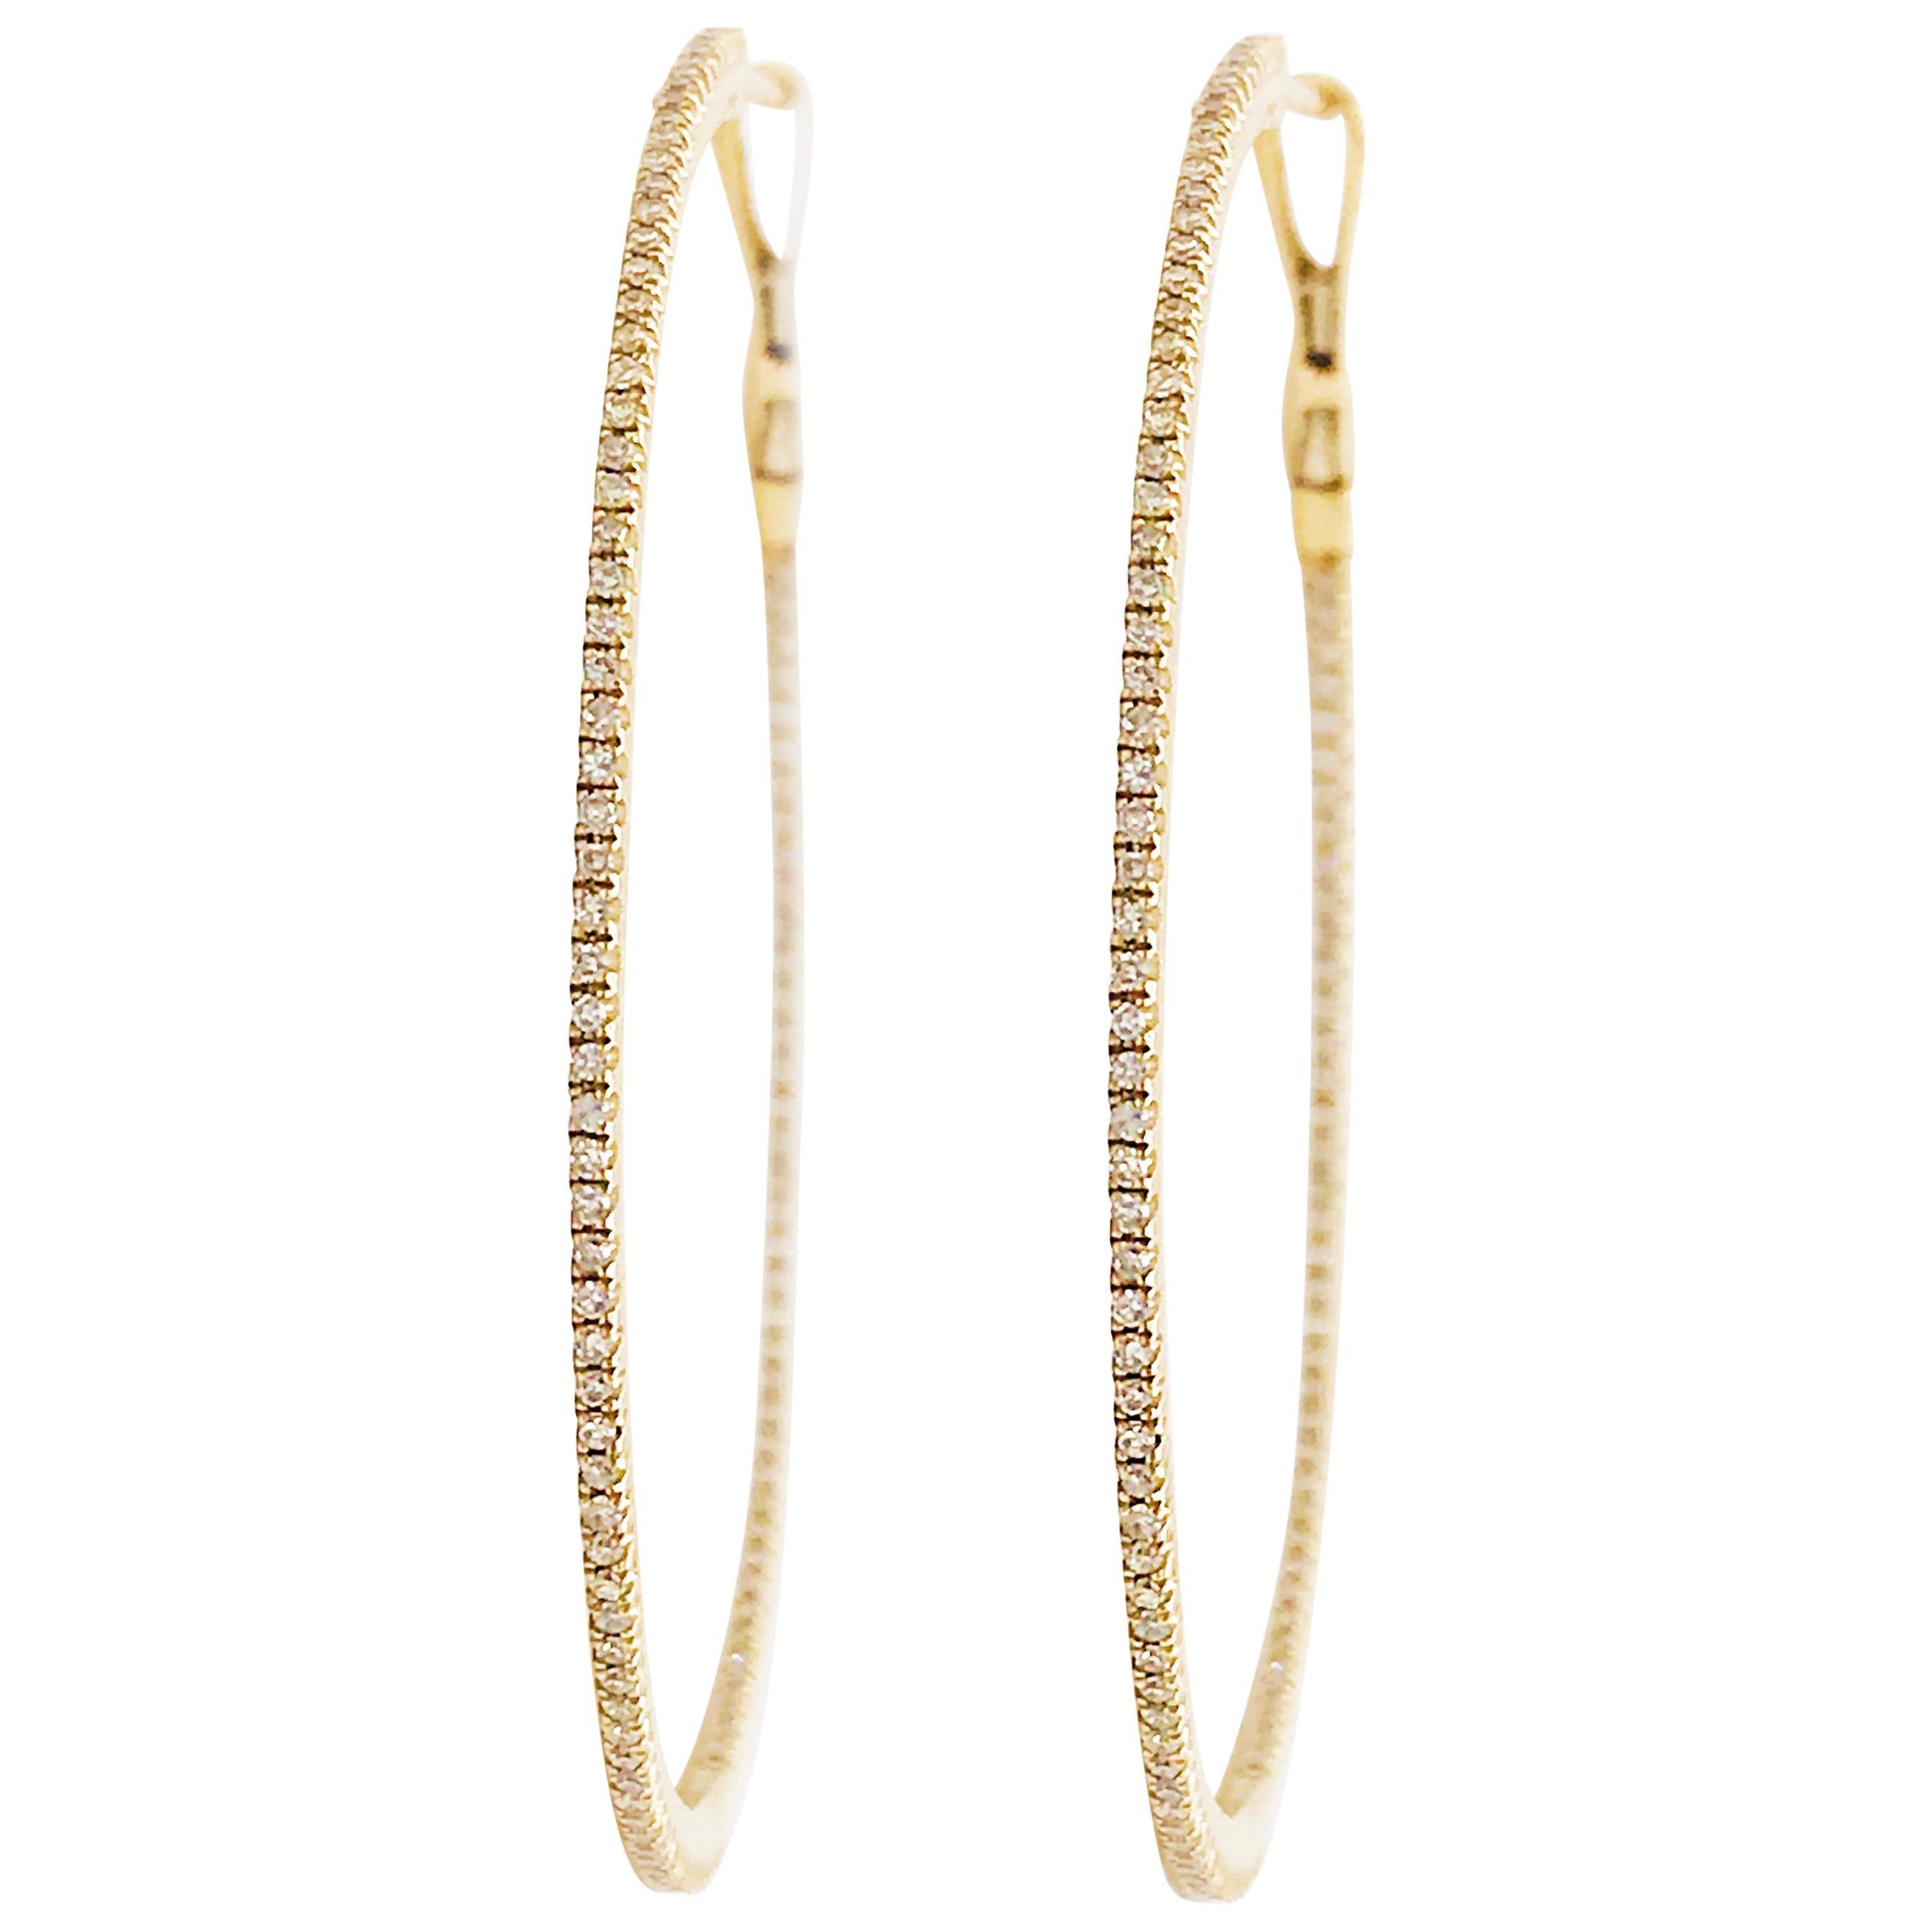 Large Diamond Inside Out Hoop Earrings 14K Yellow Gold 3/4 Carat Diamond Hoops